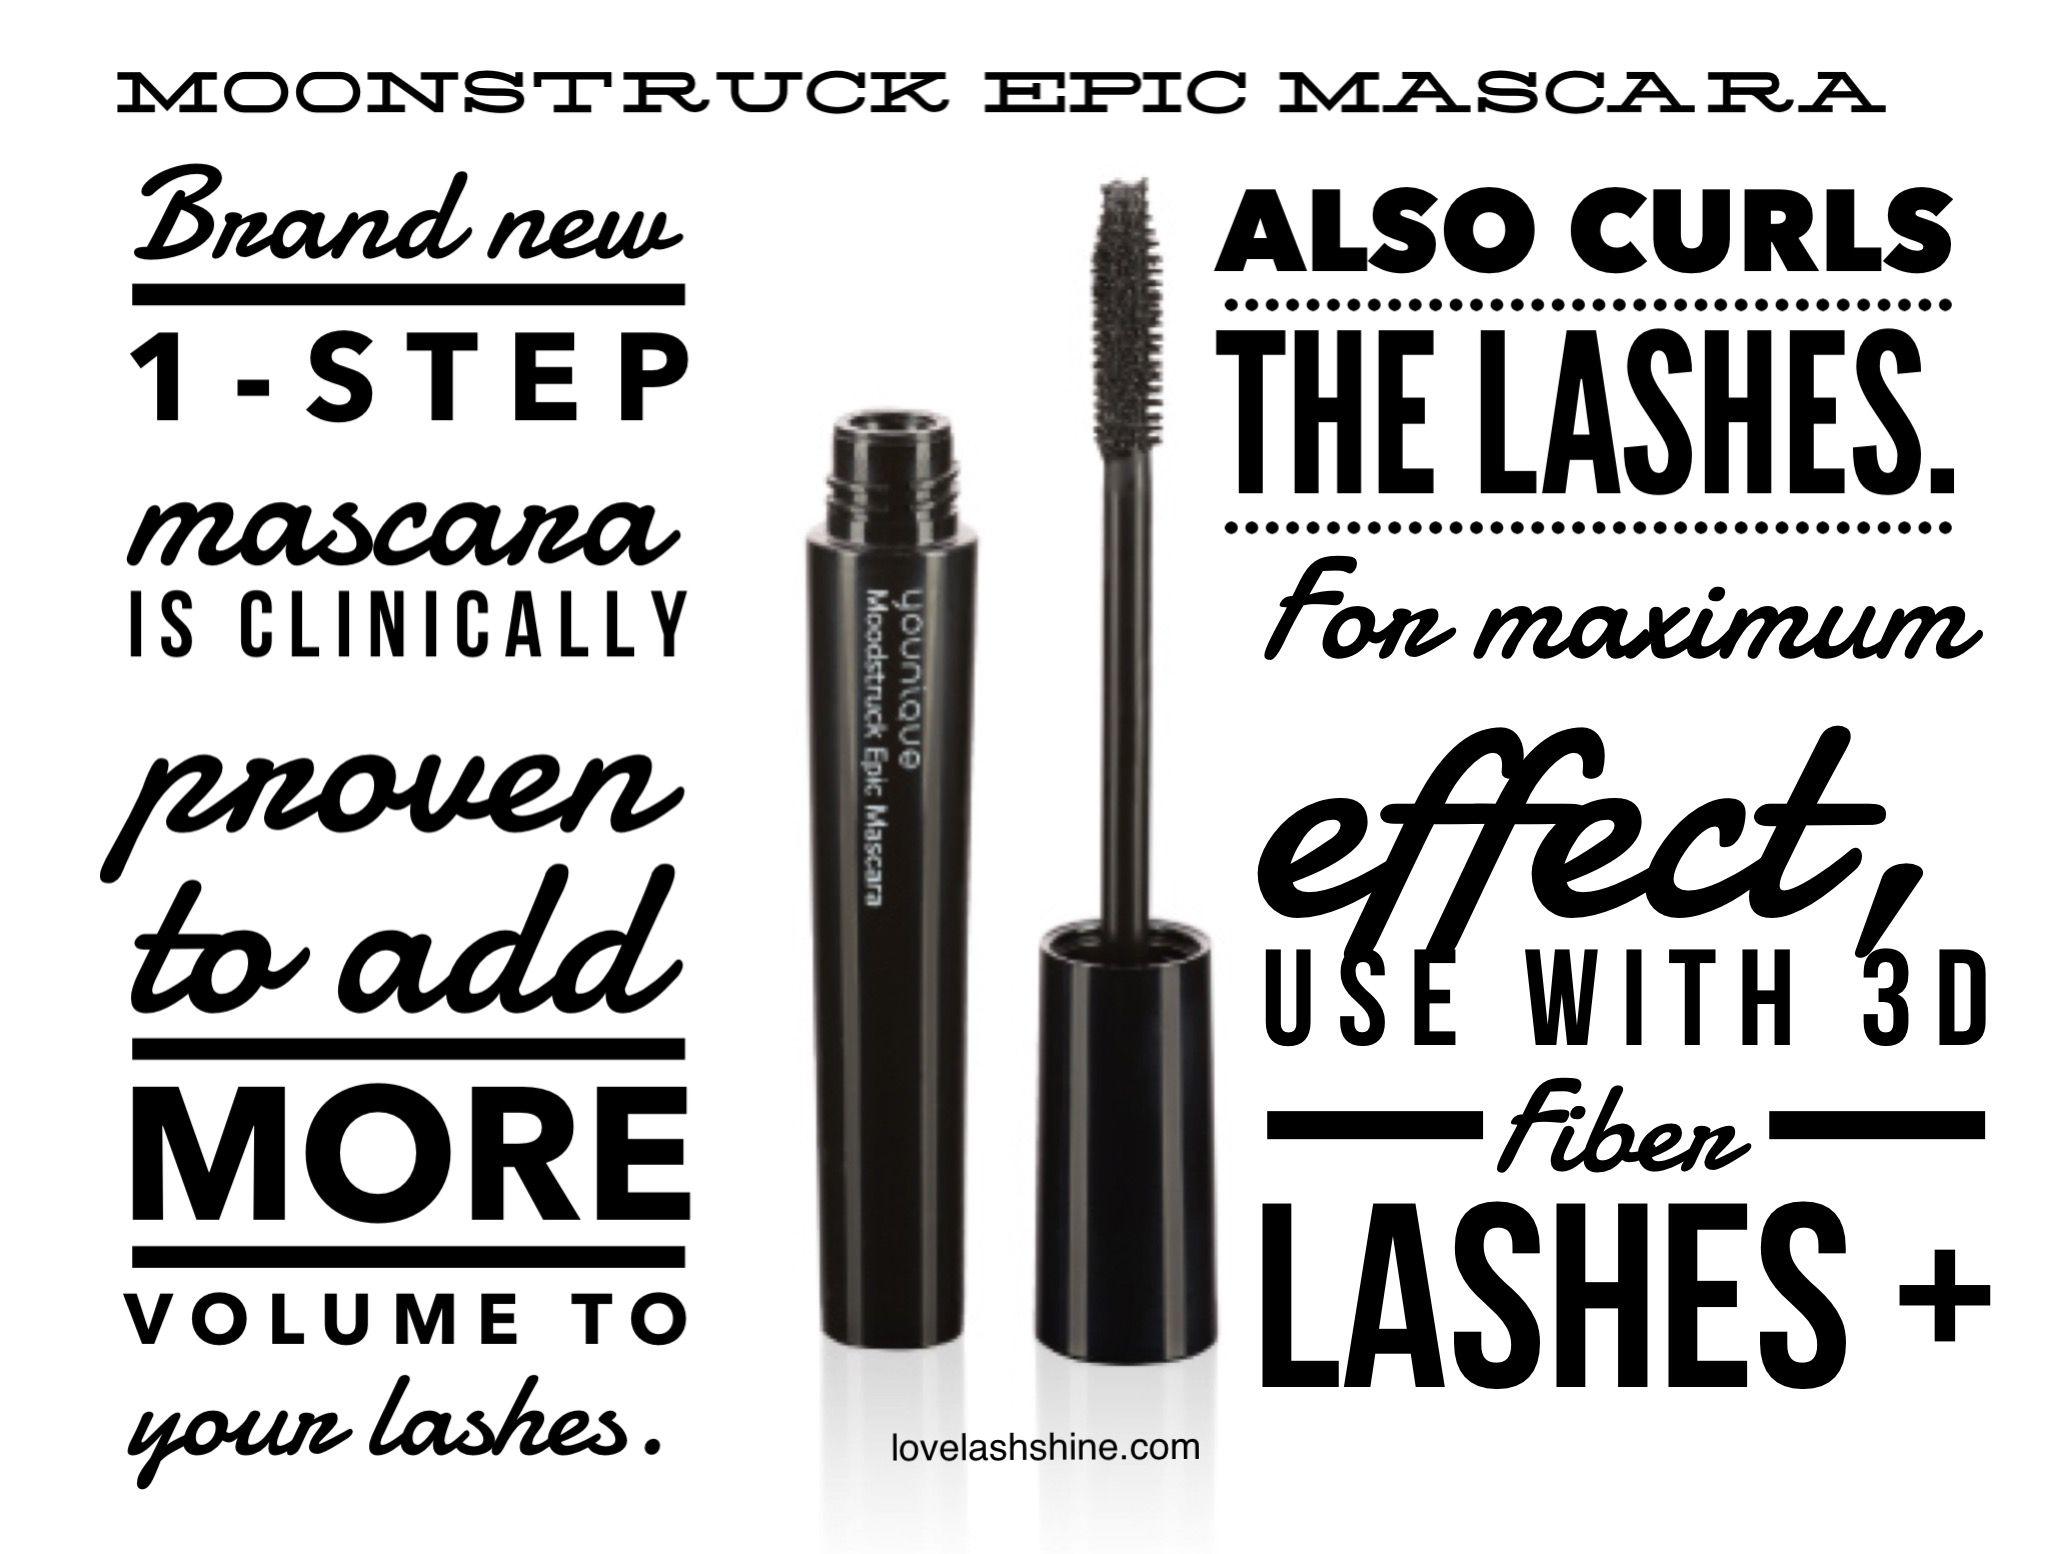 Younique S New Moonstruck Epic Mascara Curls Lashes